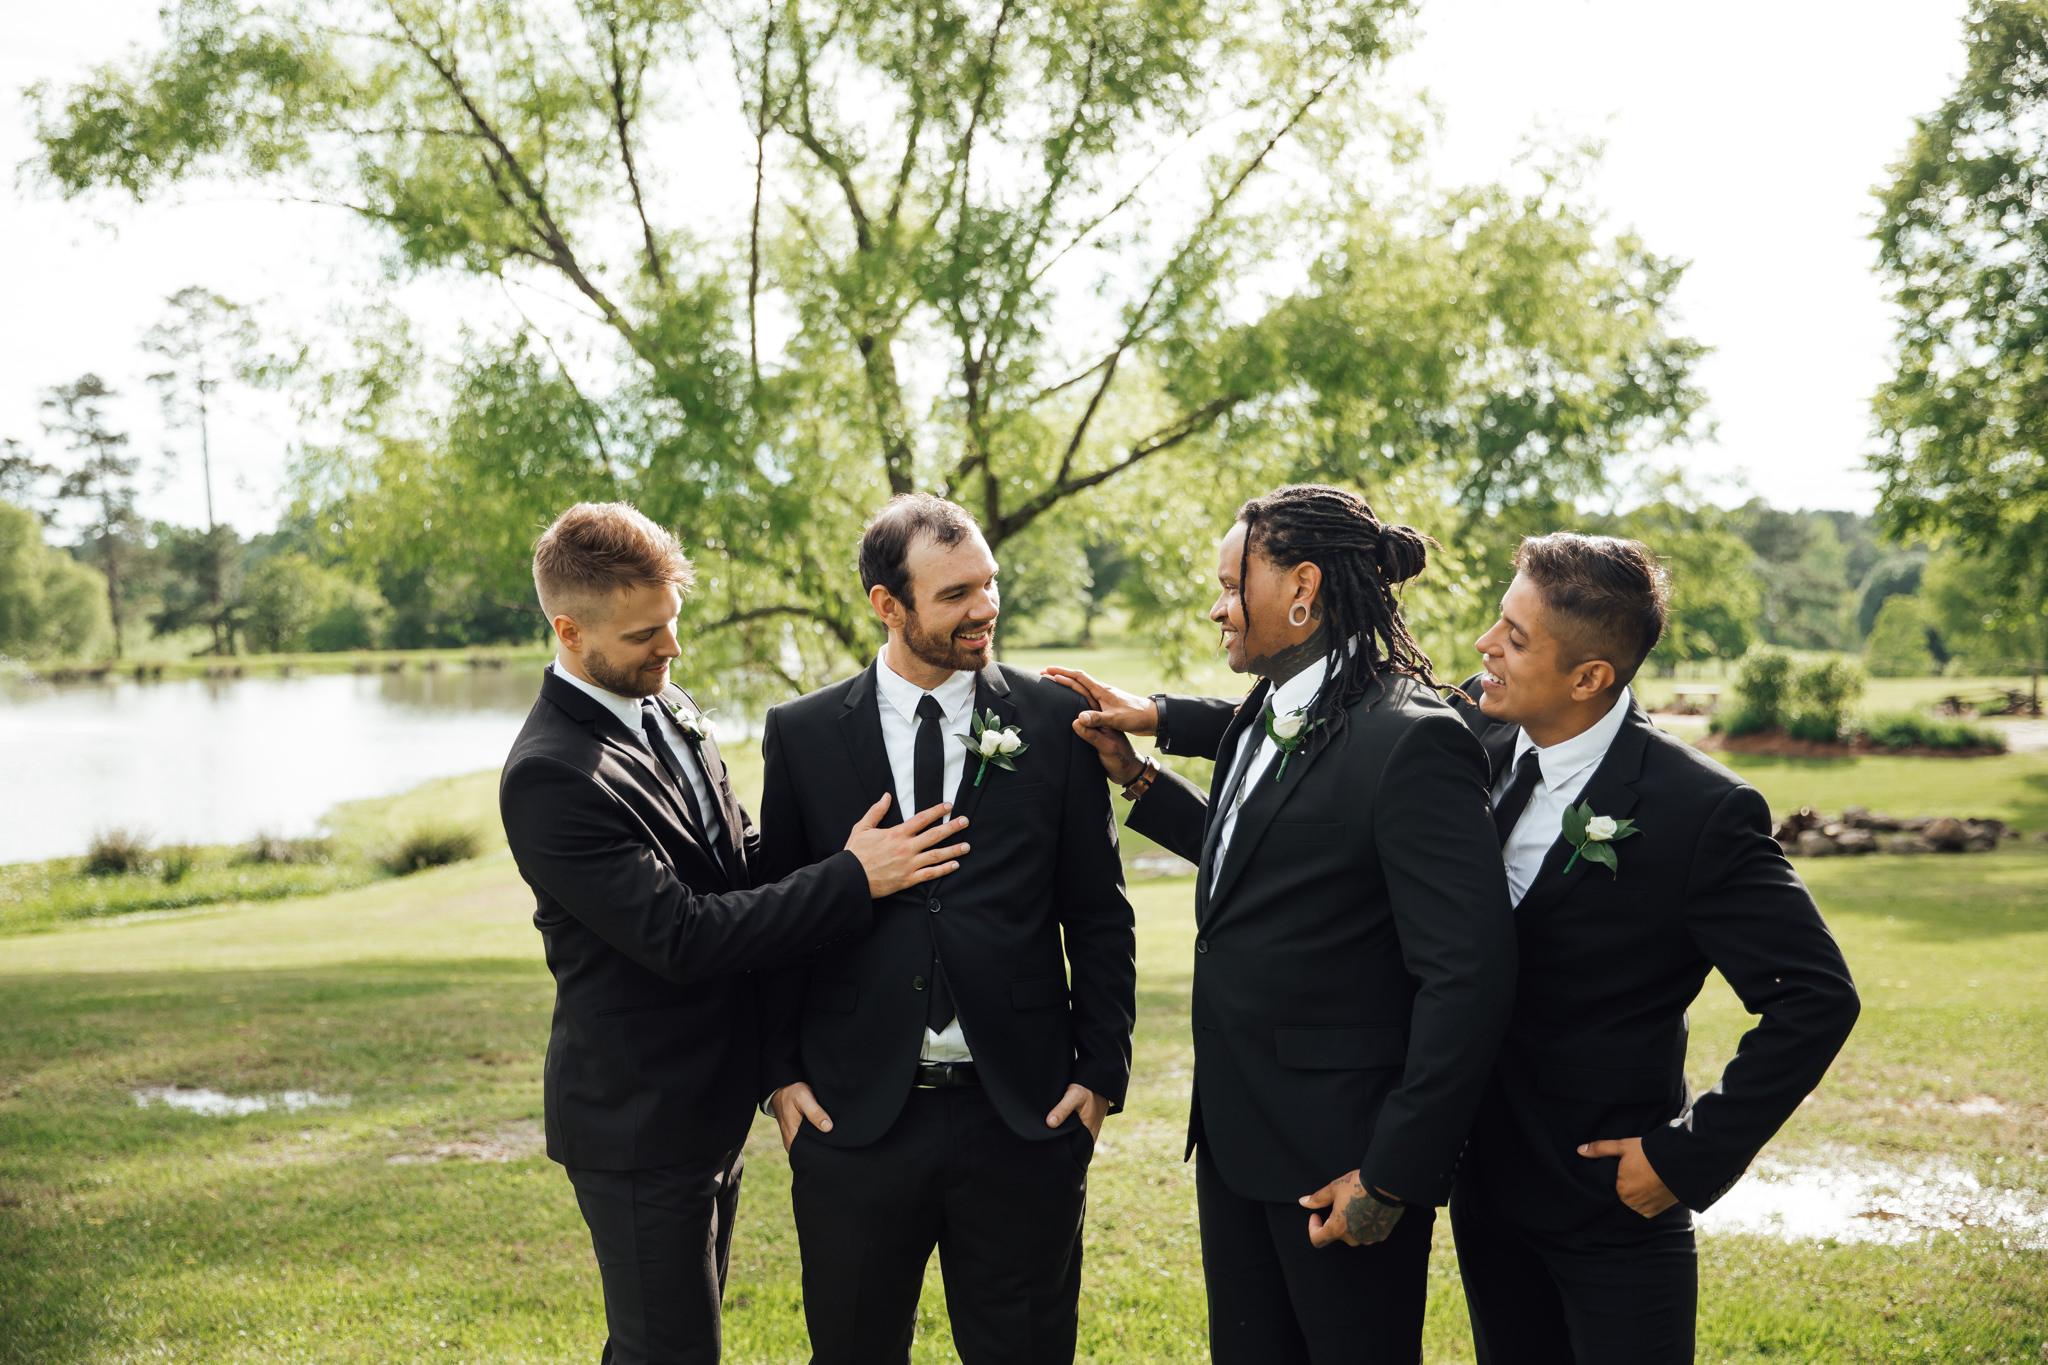 phantom-canyon-brewery-colorado-springs-wedding-photographer-331.jpg